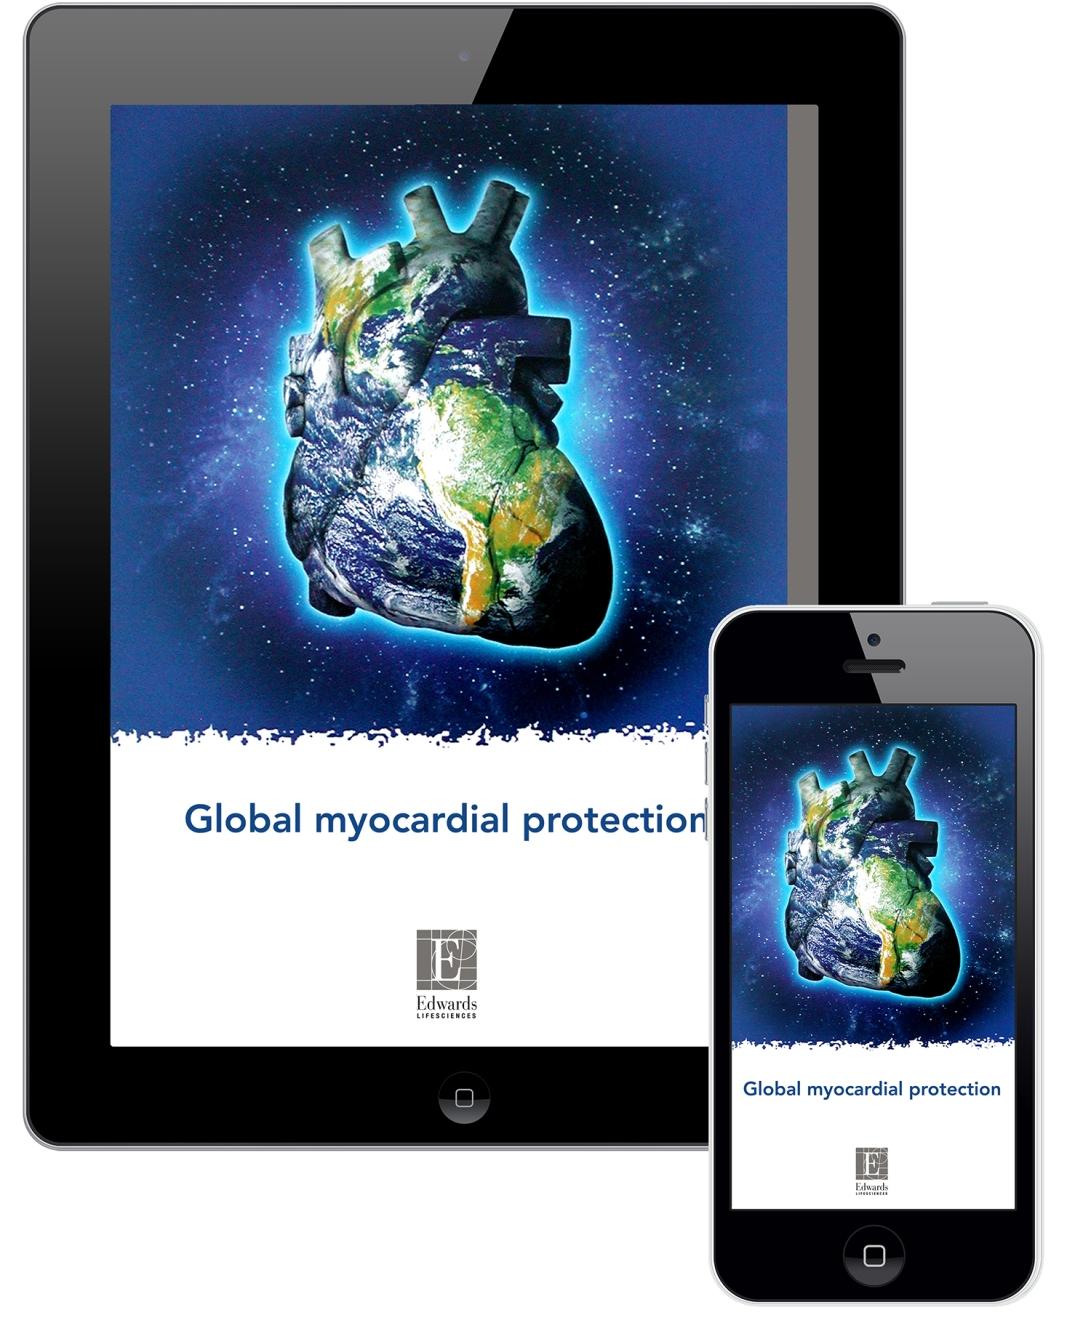 Global myo